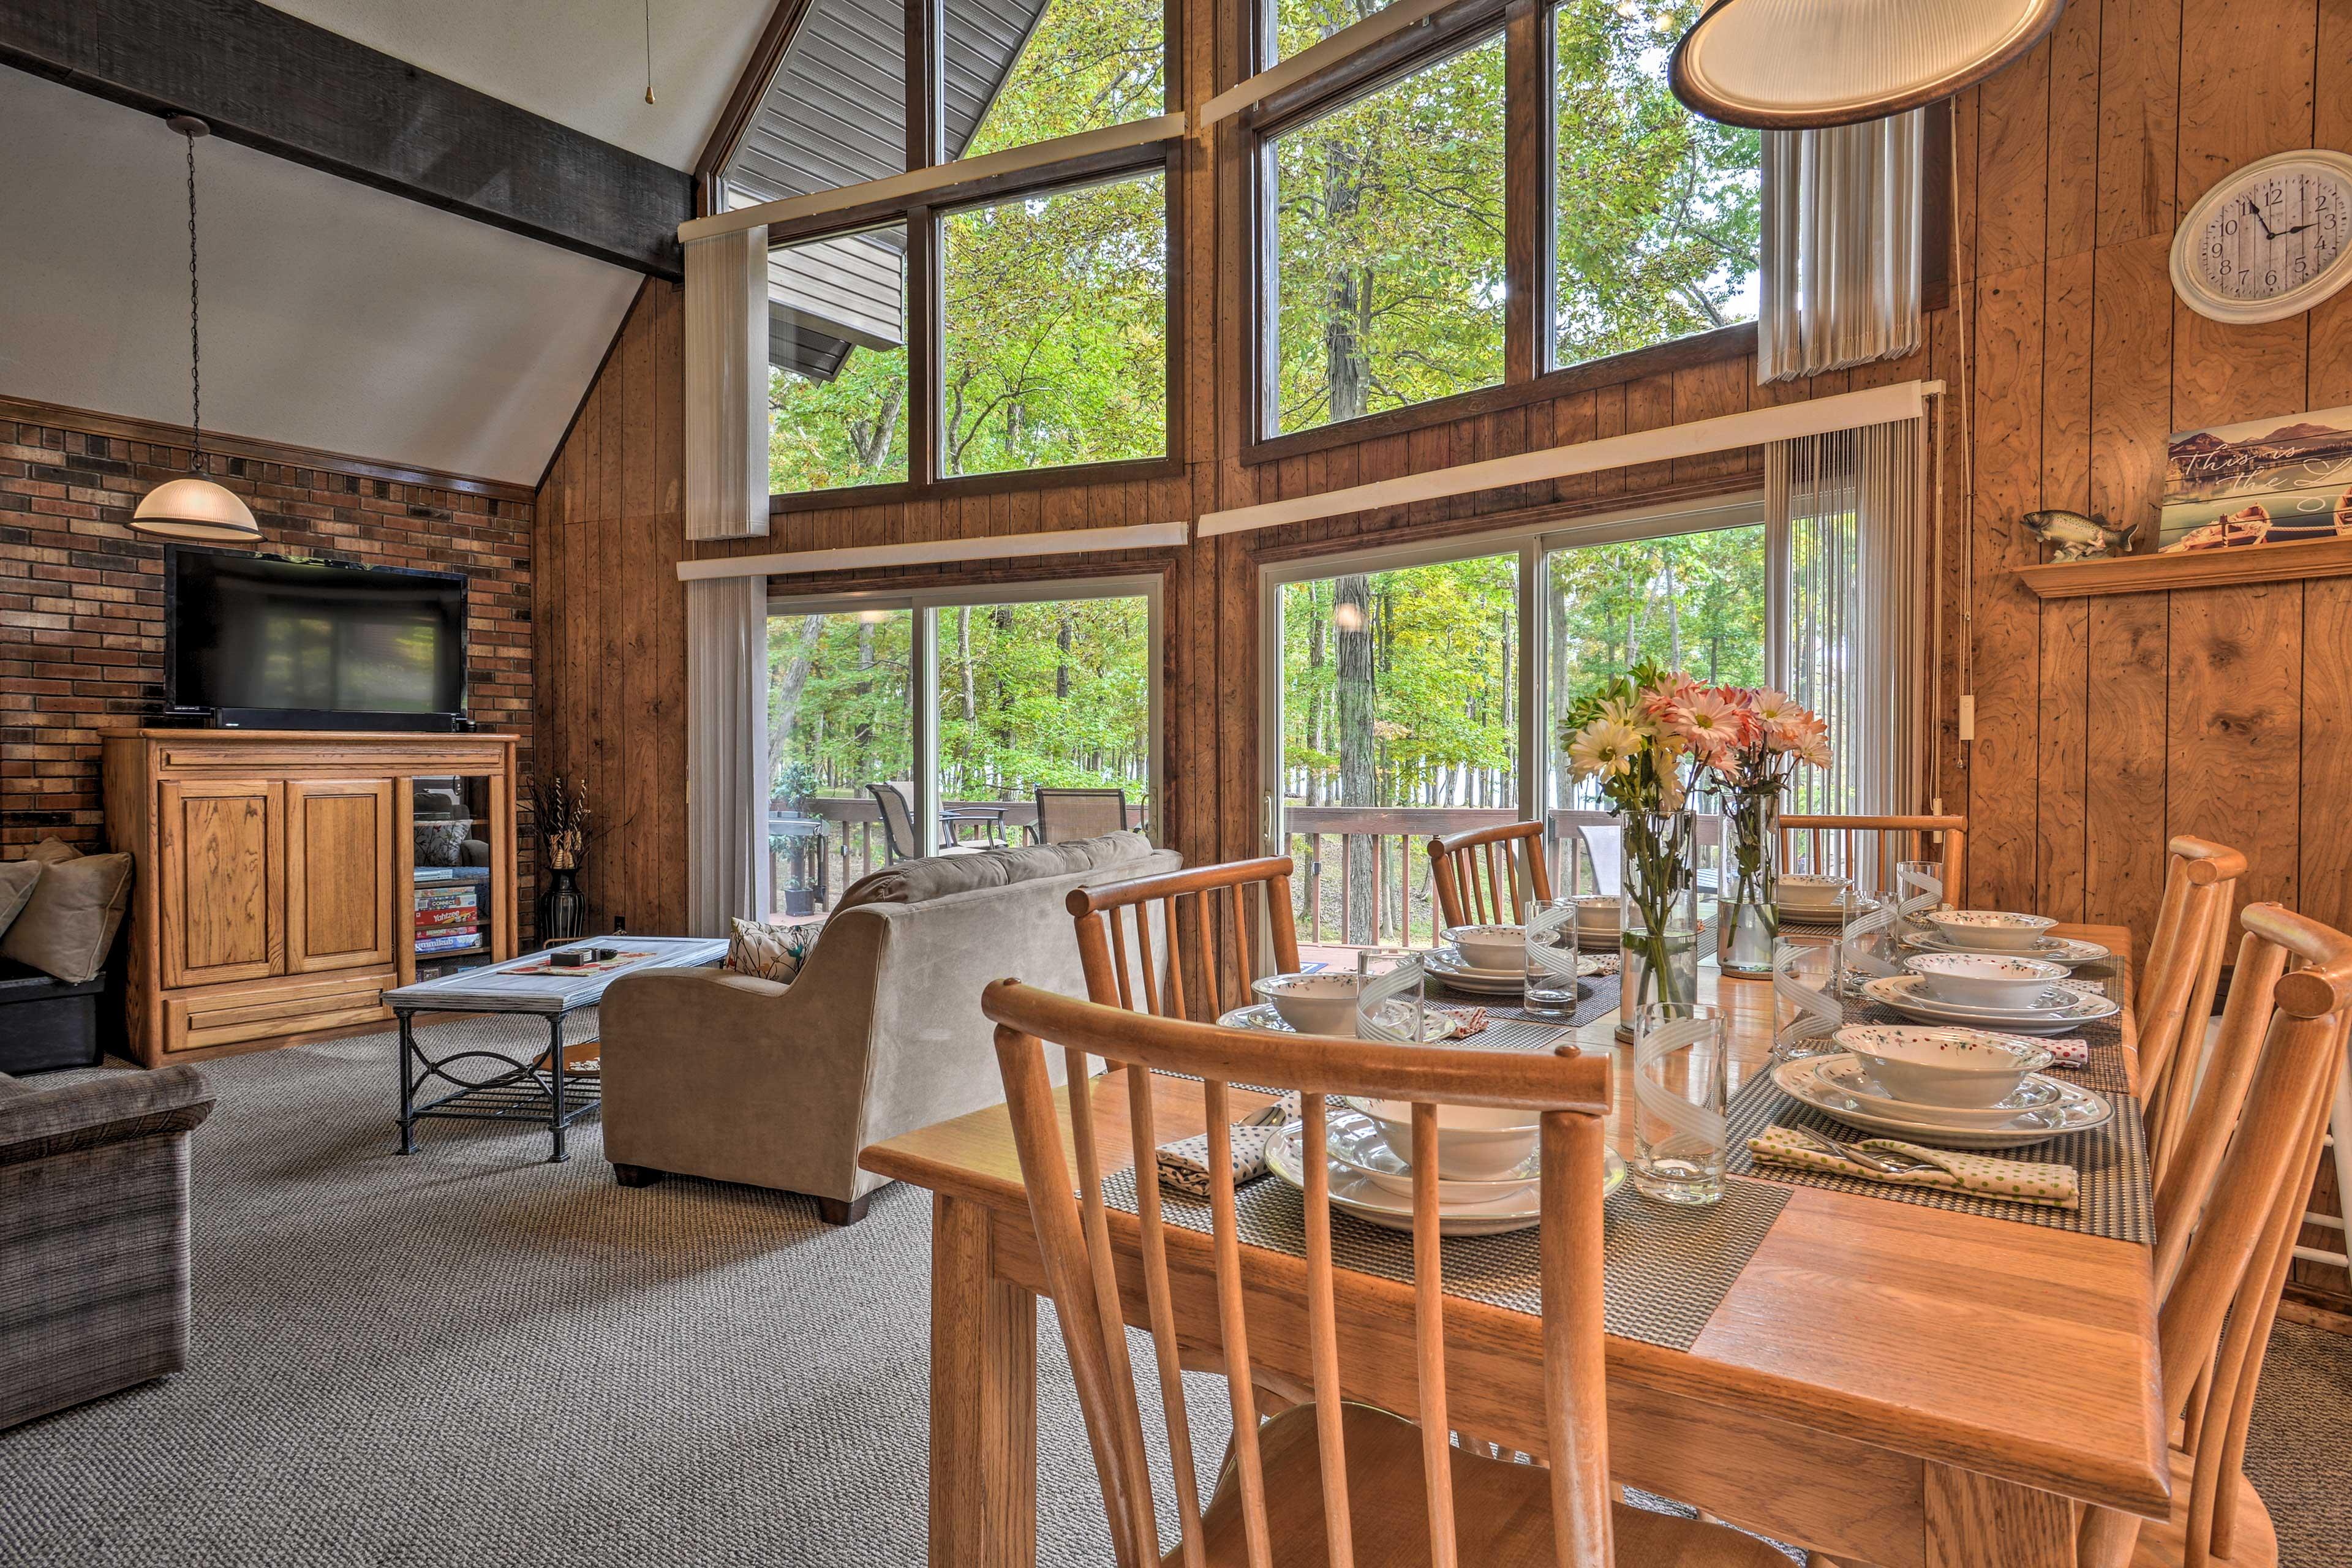 Natural light illuminates the entire home.